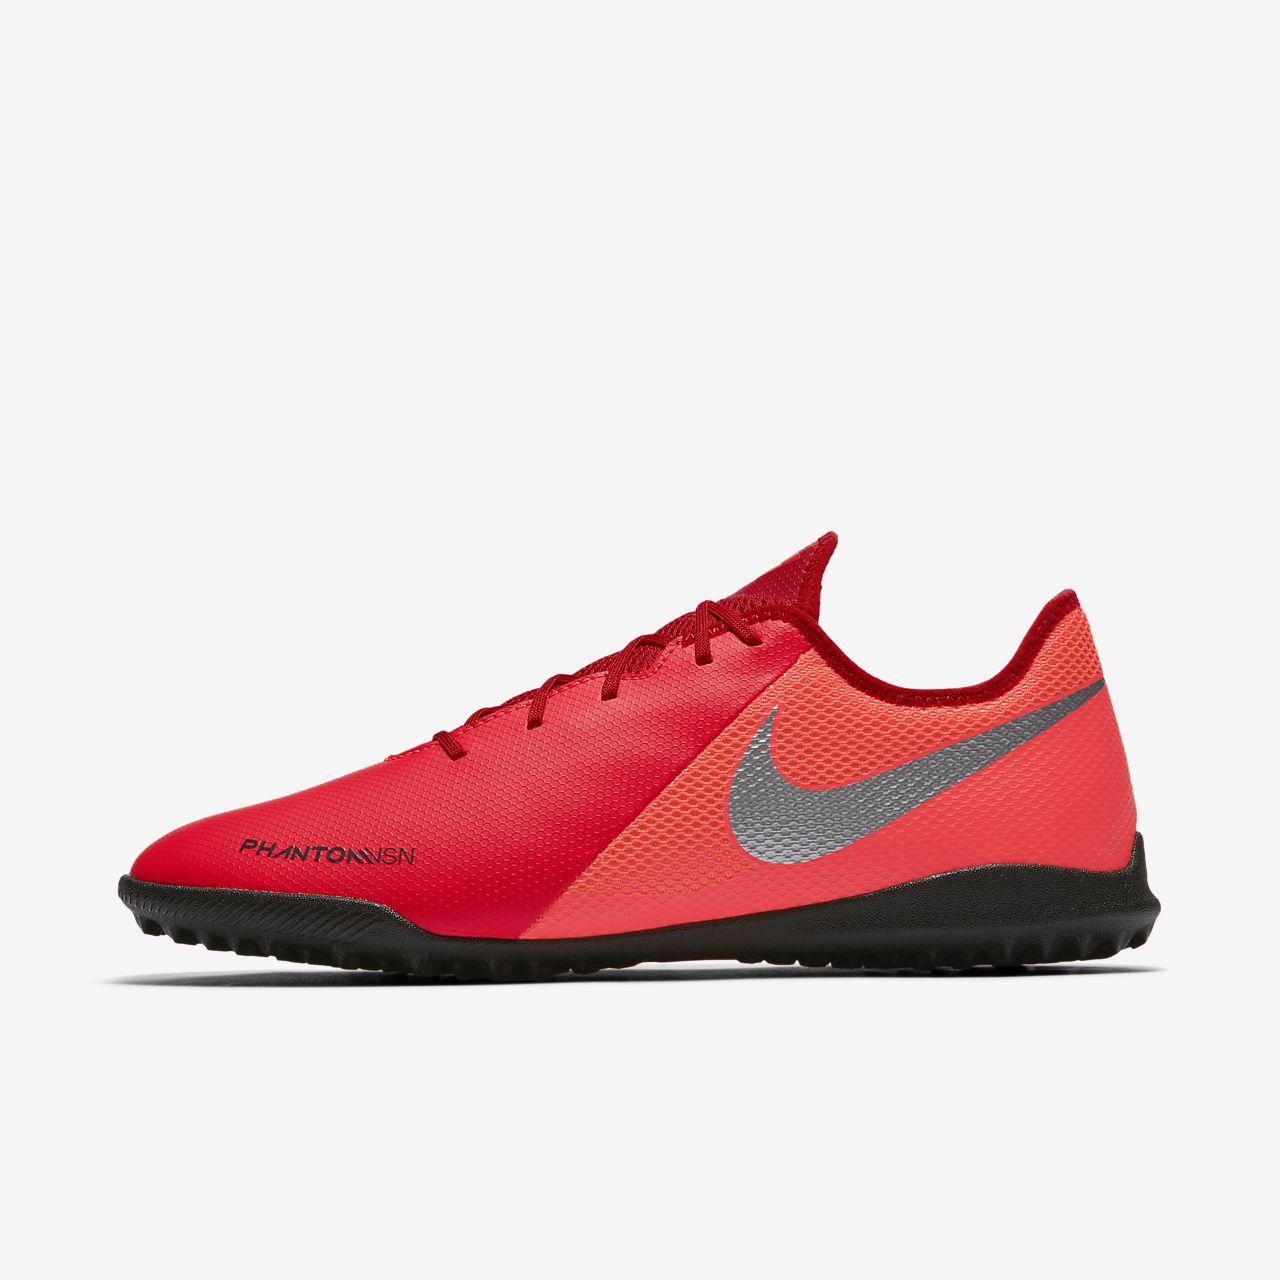 Chaussure de football à crampons pour surface synthétique Nike Phantom Vision Academy